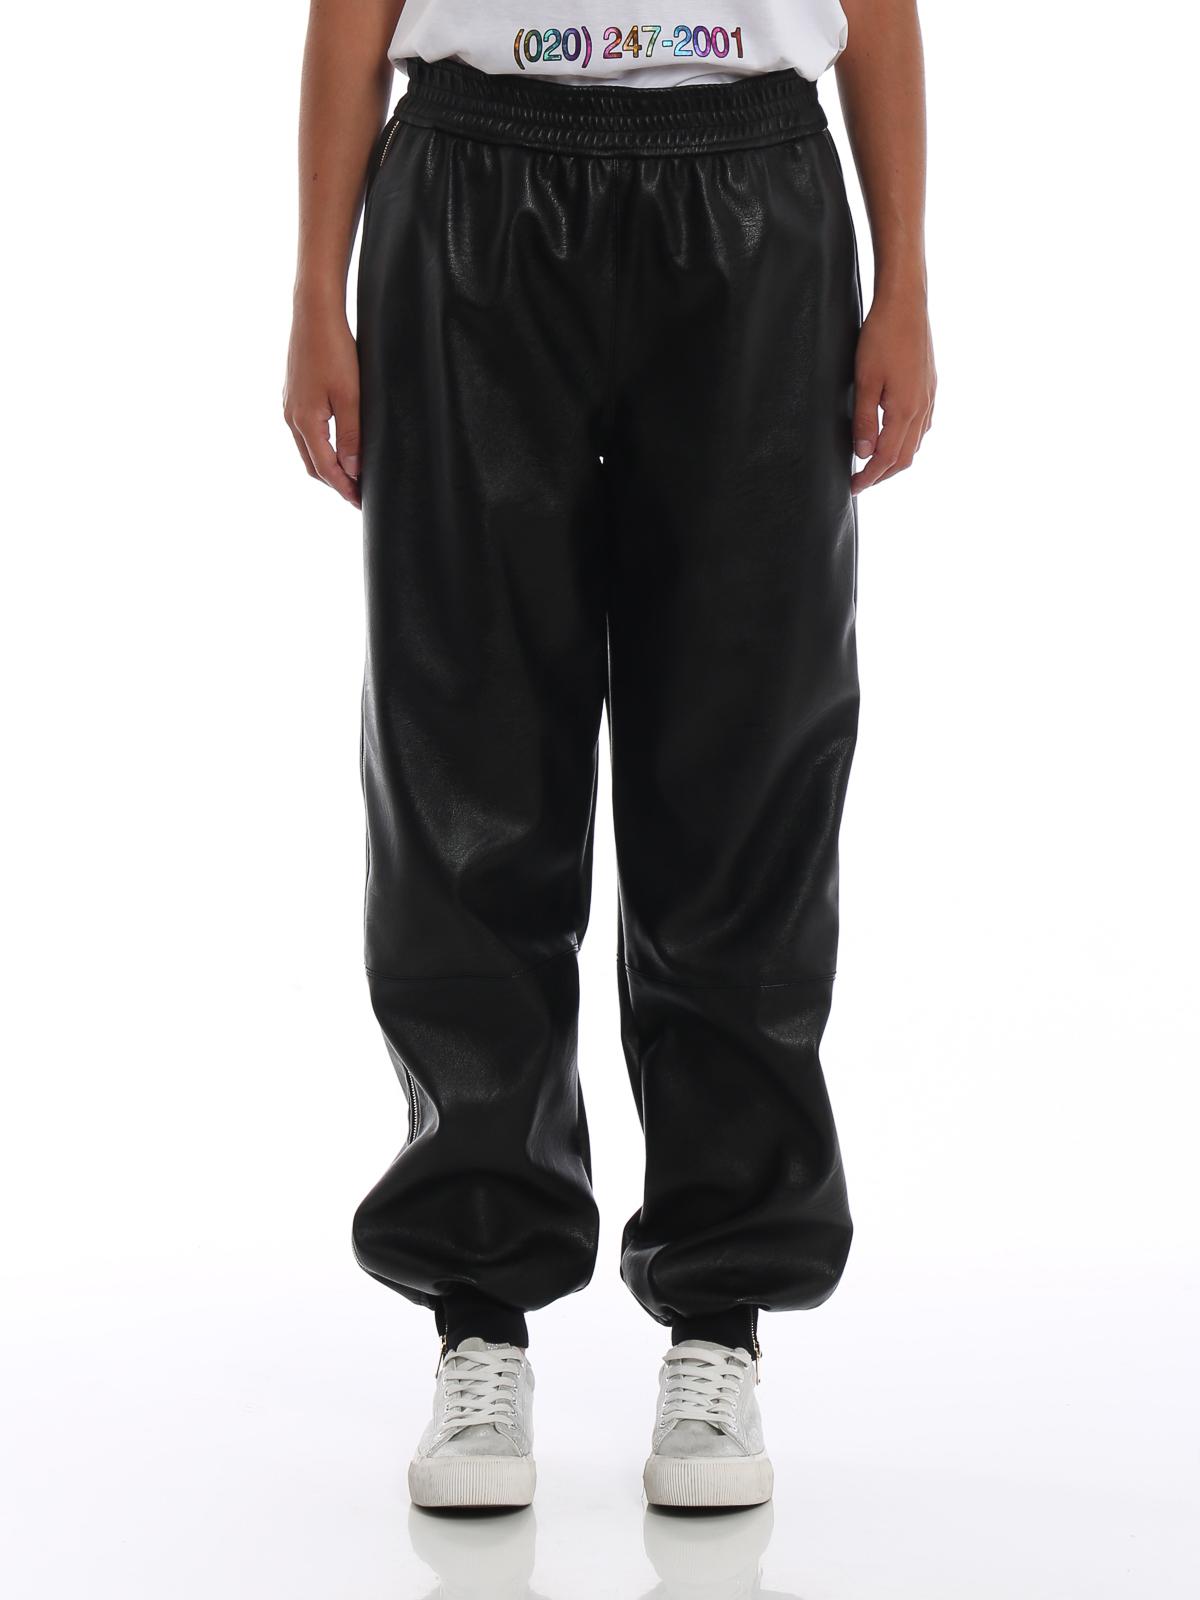 Zip Stella Laterali Con In Mccartney Finta Pelle Pantaloni wHxpTFBqwC